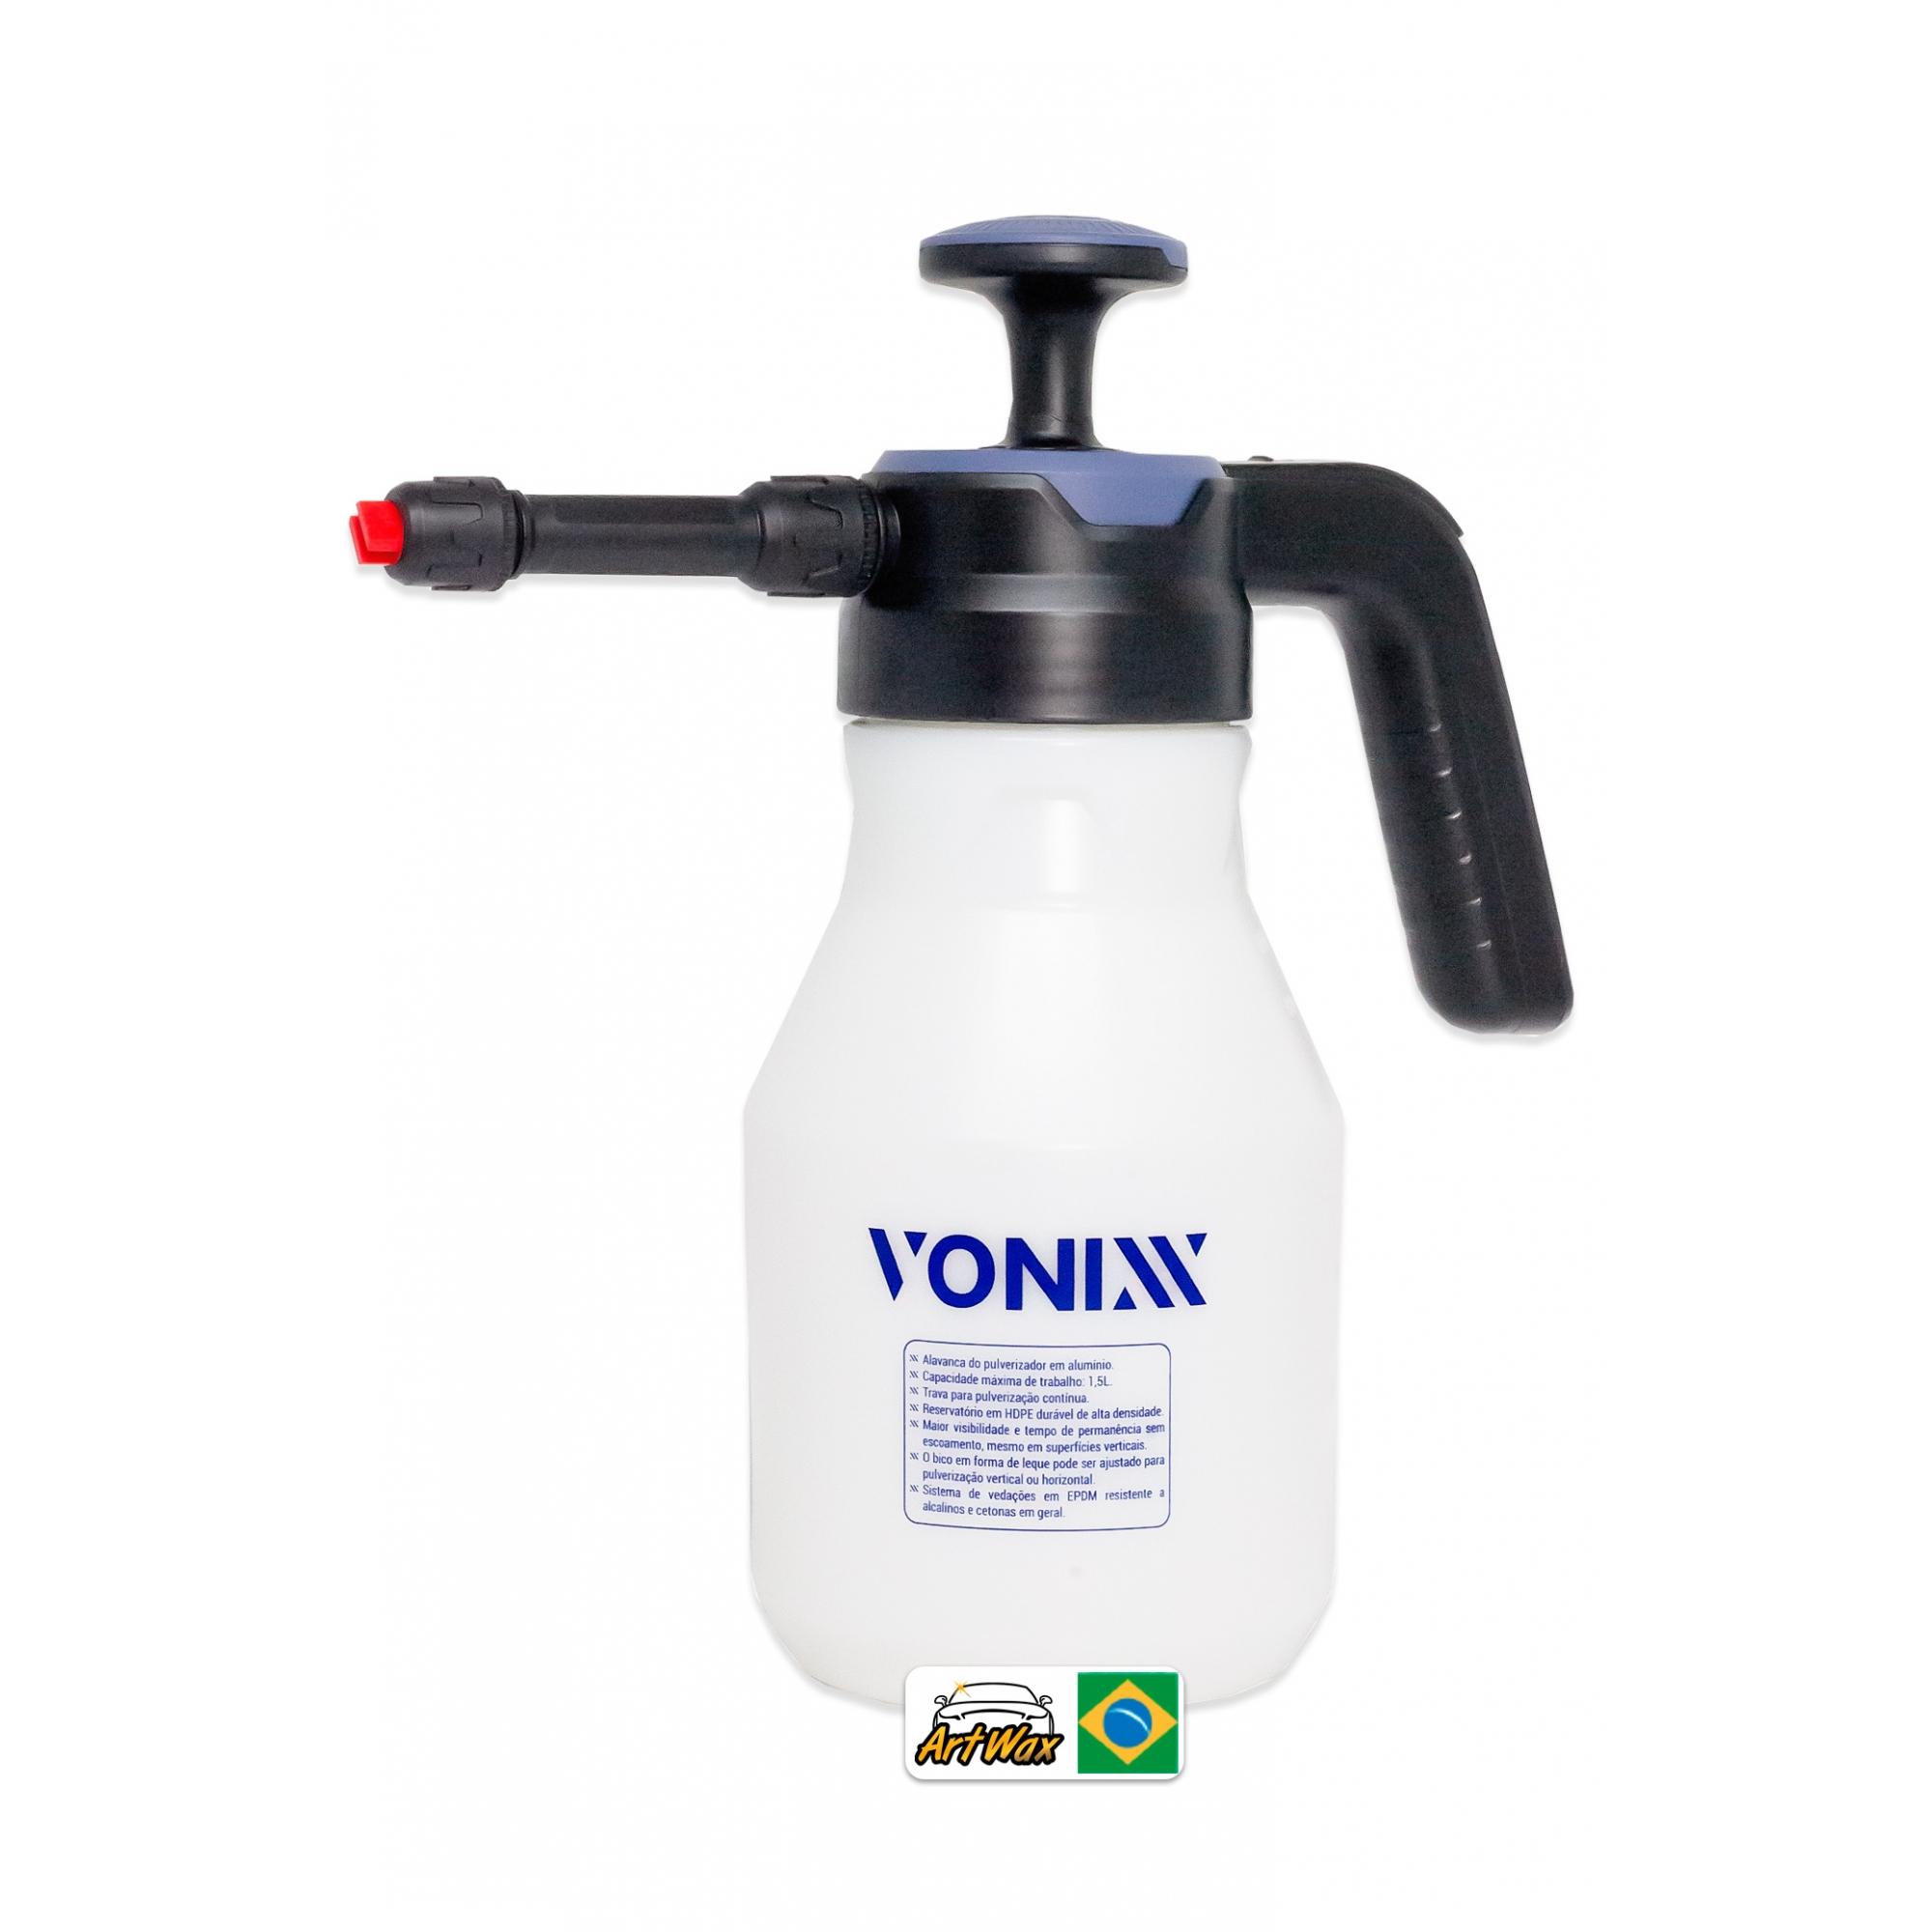 Vonixx Pulverizador Gerador de Espuma Compressão Manual 1.5L